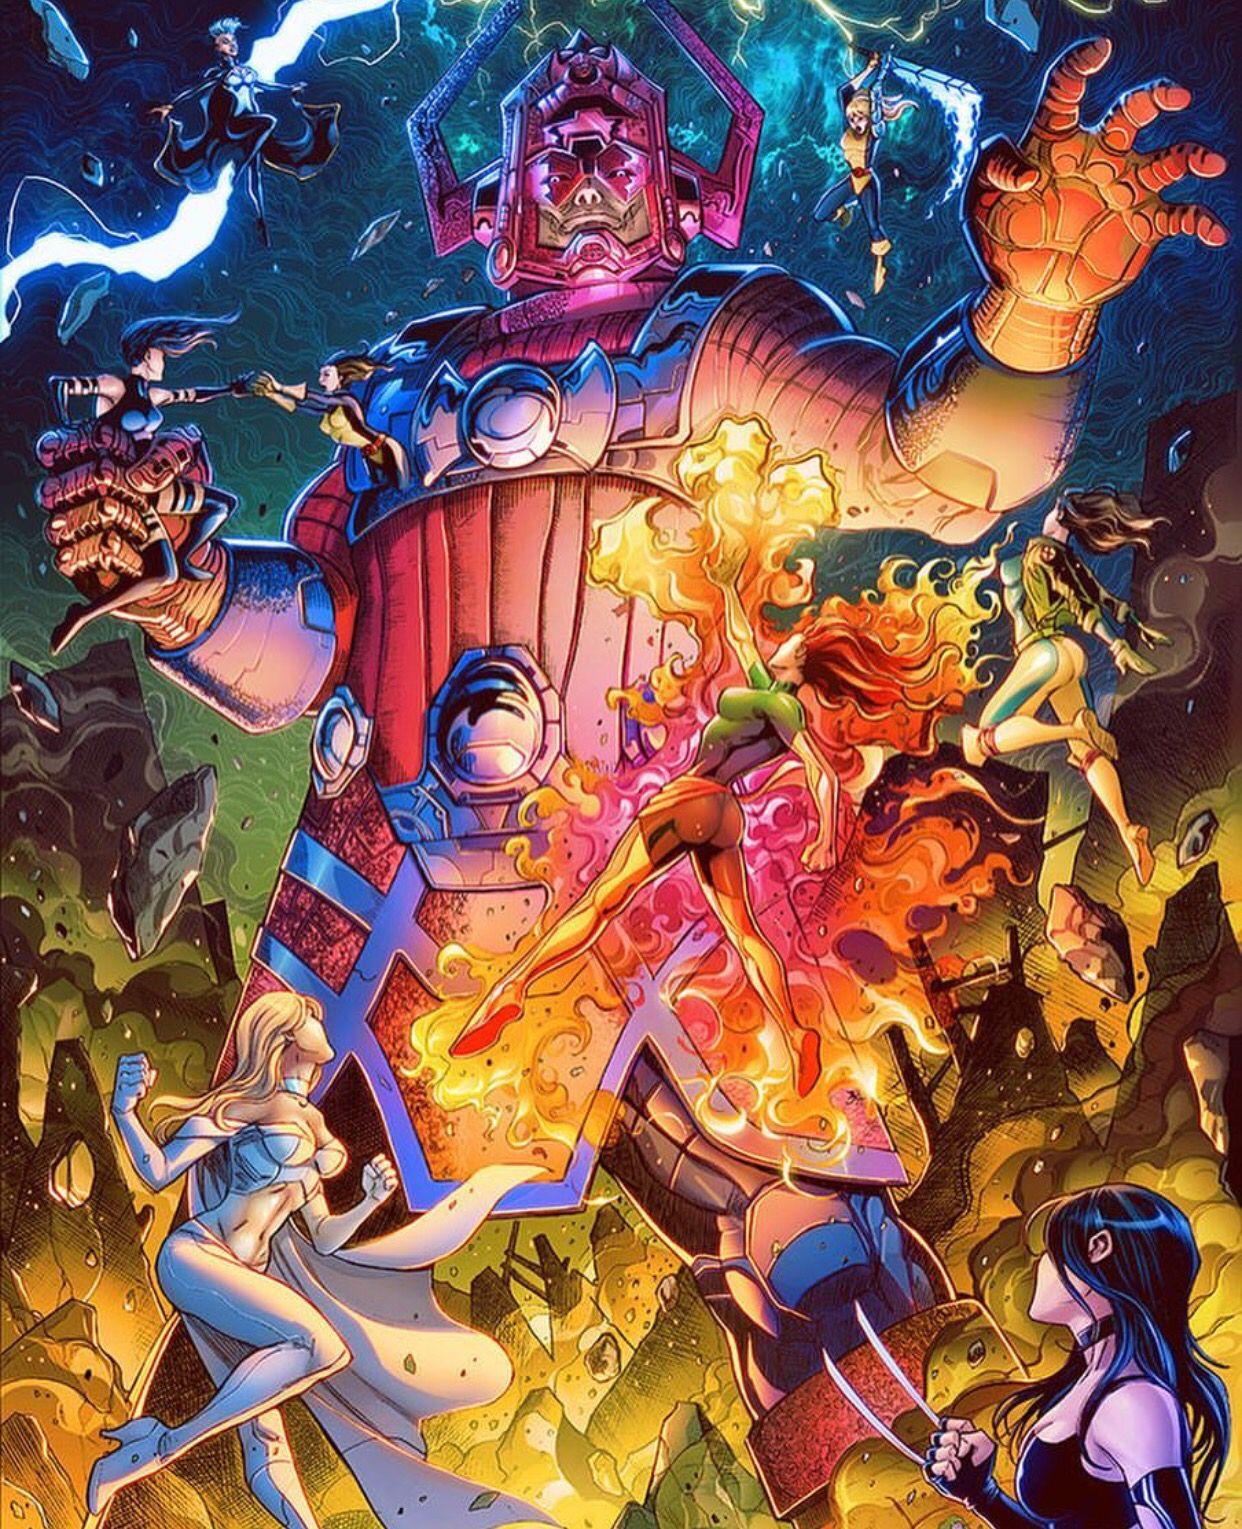 X-men Vs Galactus  Marvel comics art, Marvel artwork, Galactus marvel